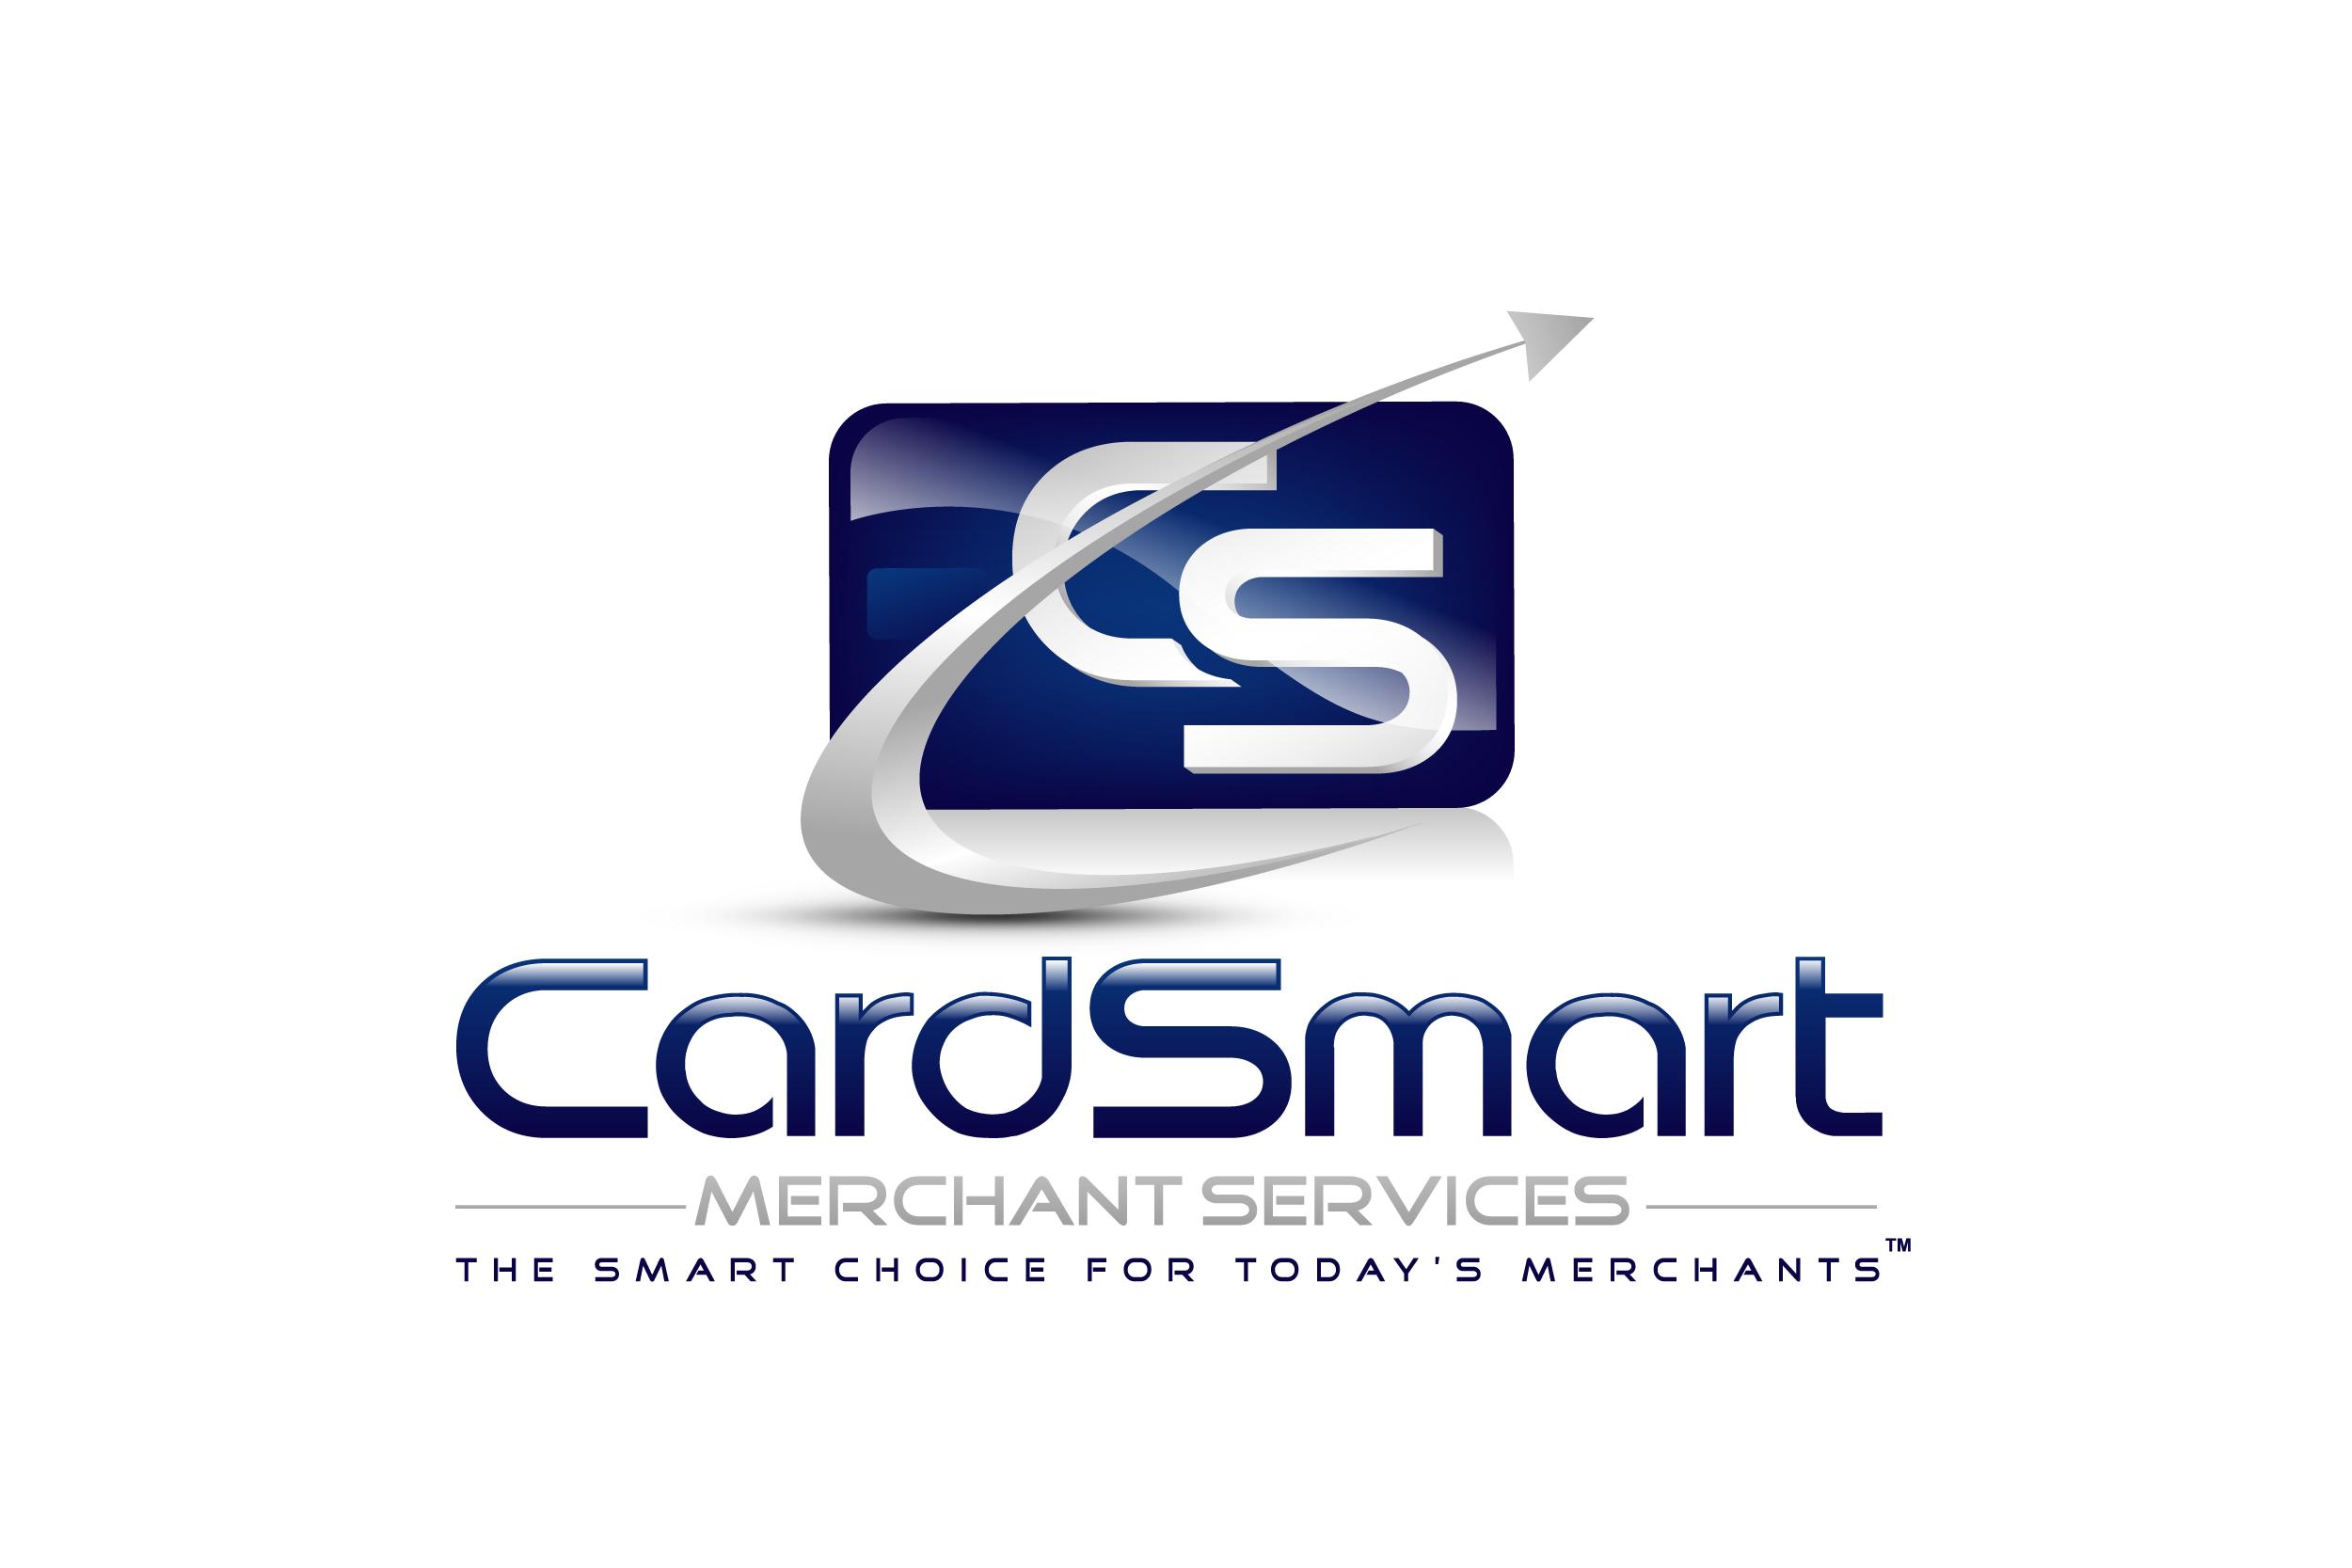 Cardsmart Merchant Services Inc